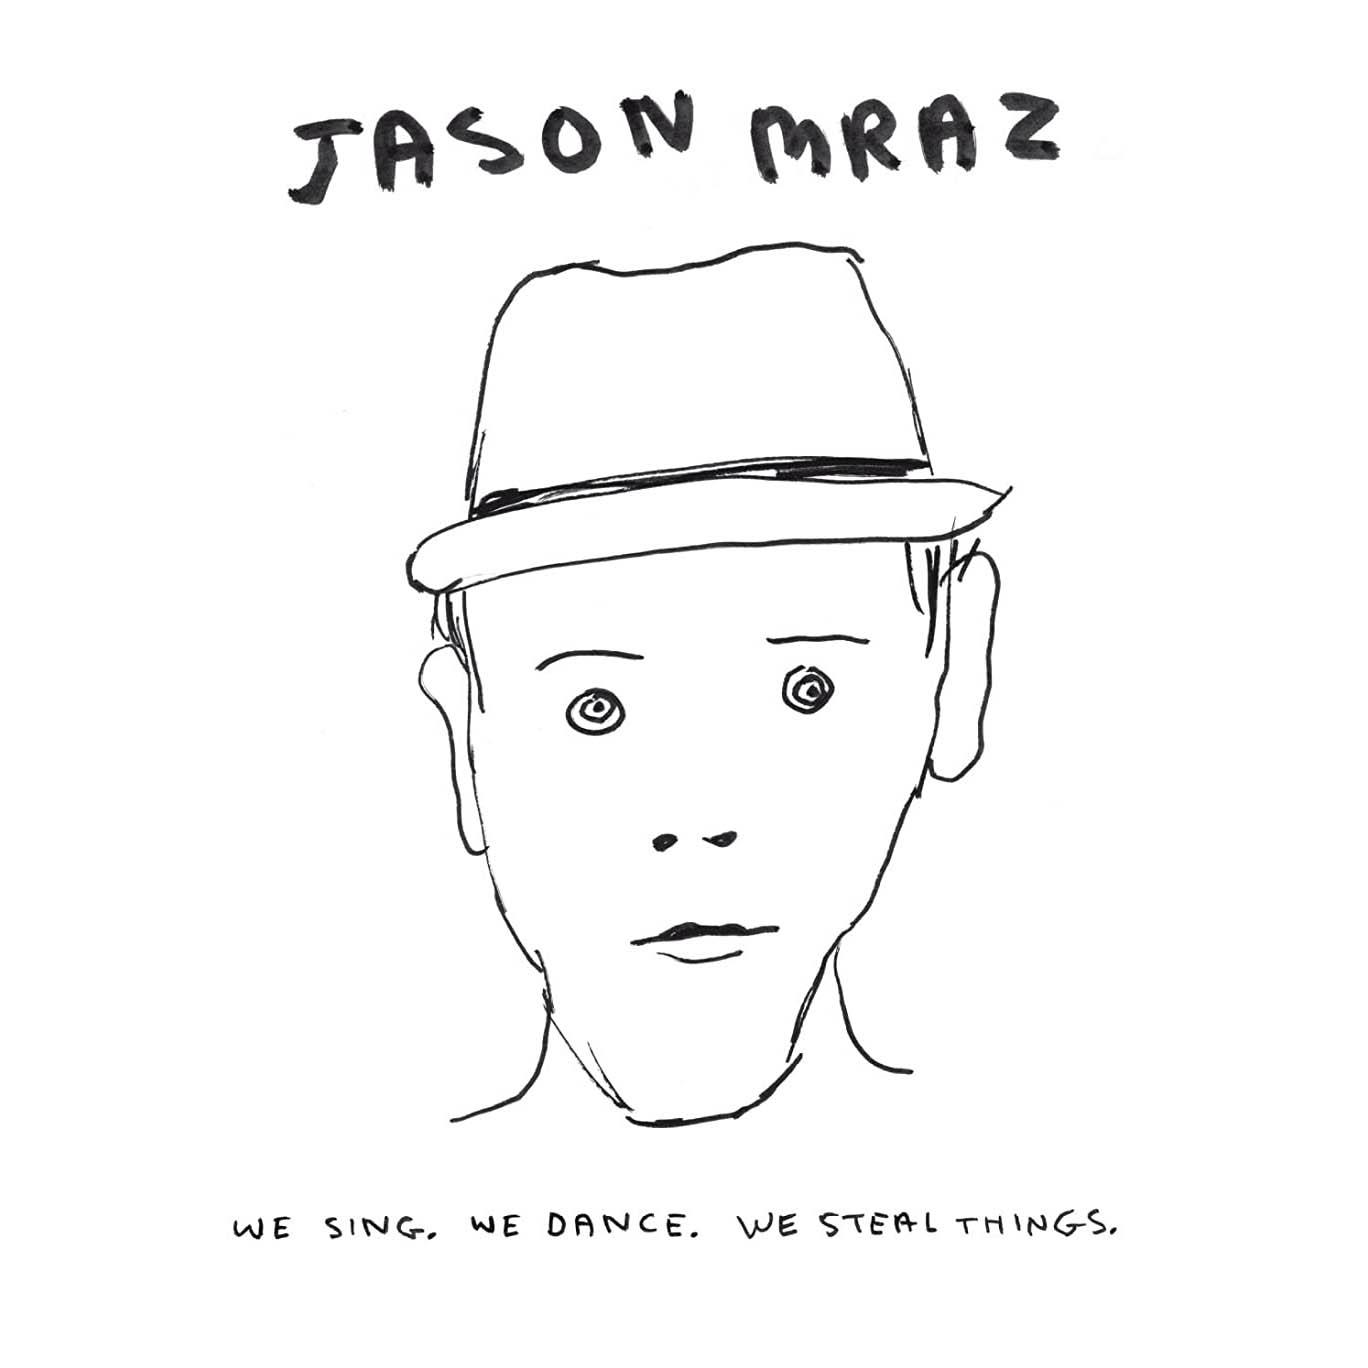 Jason Mraz, We Sing, We Dance, We Steal Things